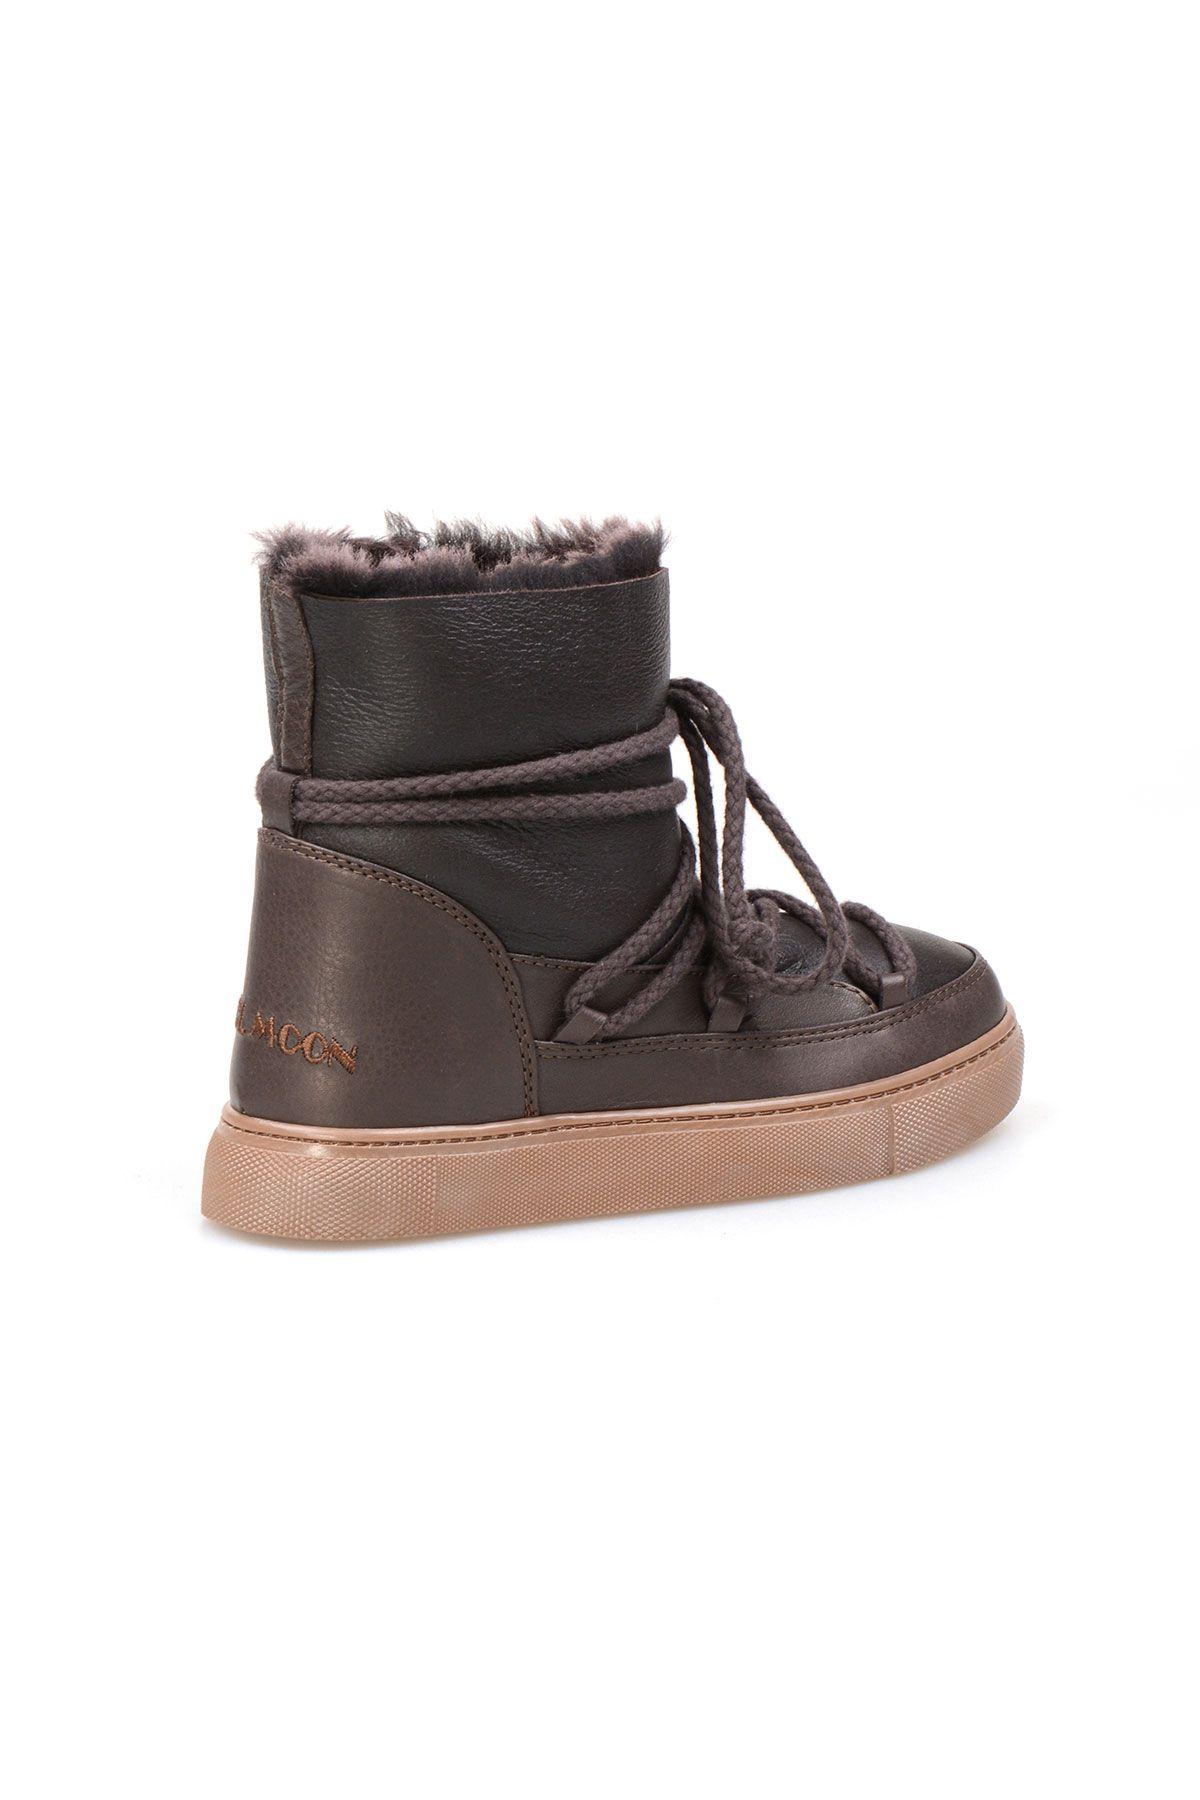 Cool Moon Genuine Suede Shearling Lined Women's Sneaker 355050 Brown